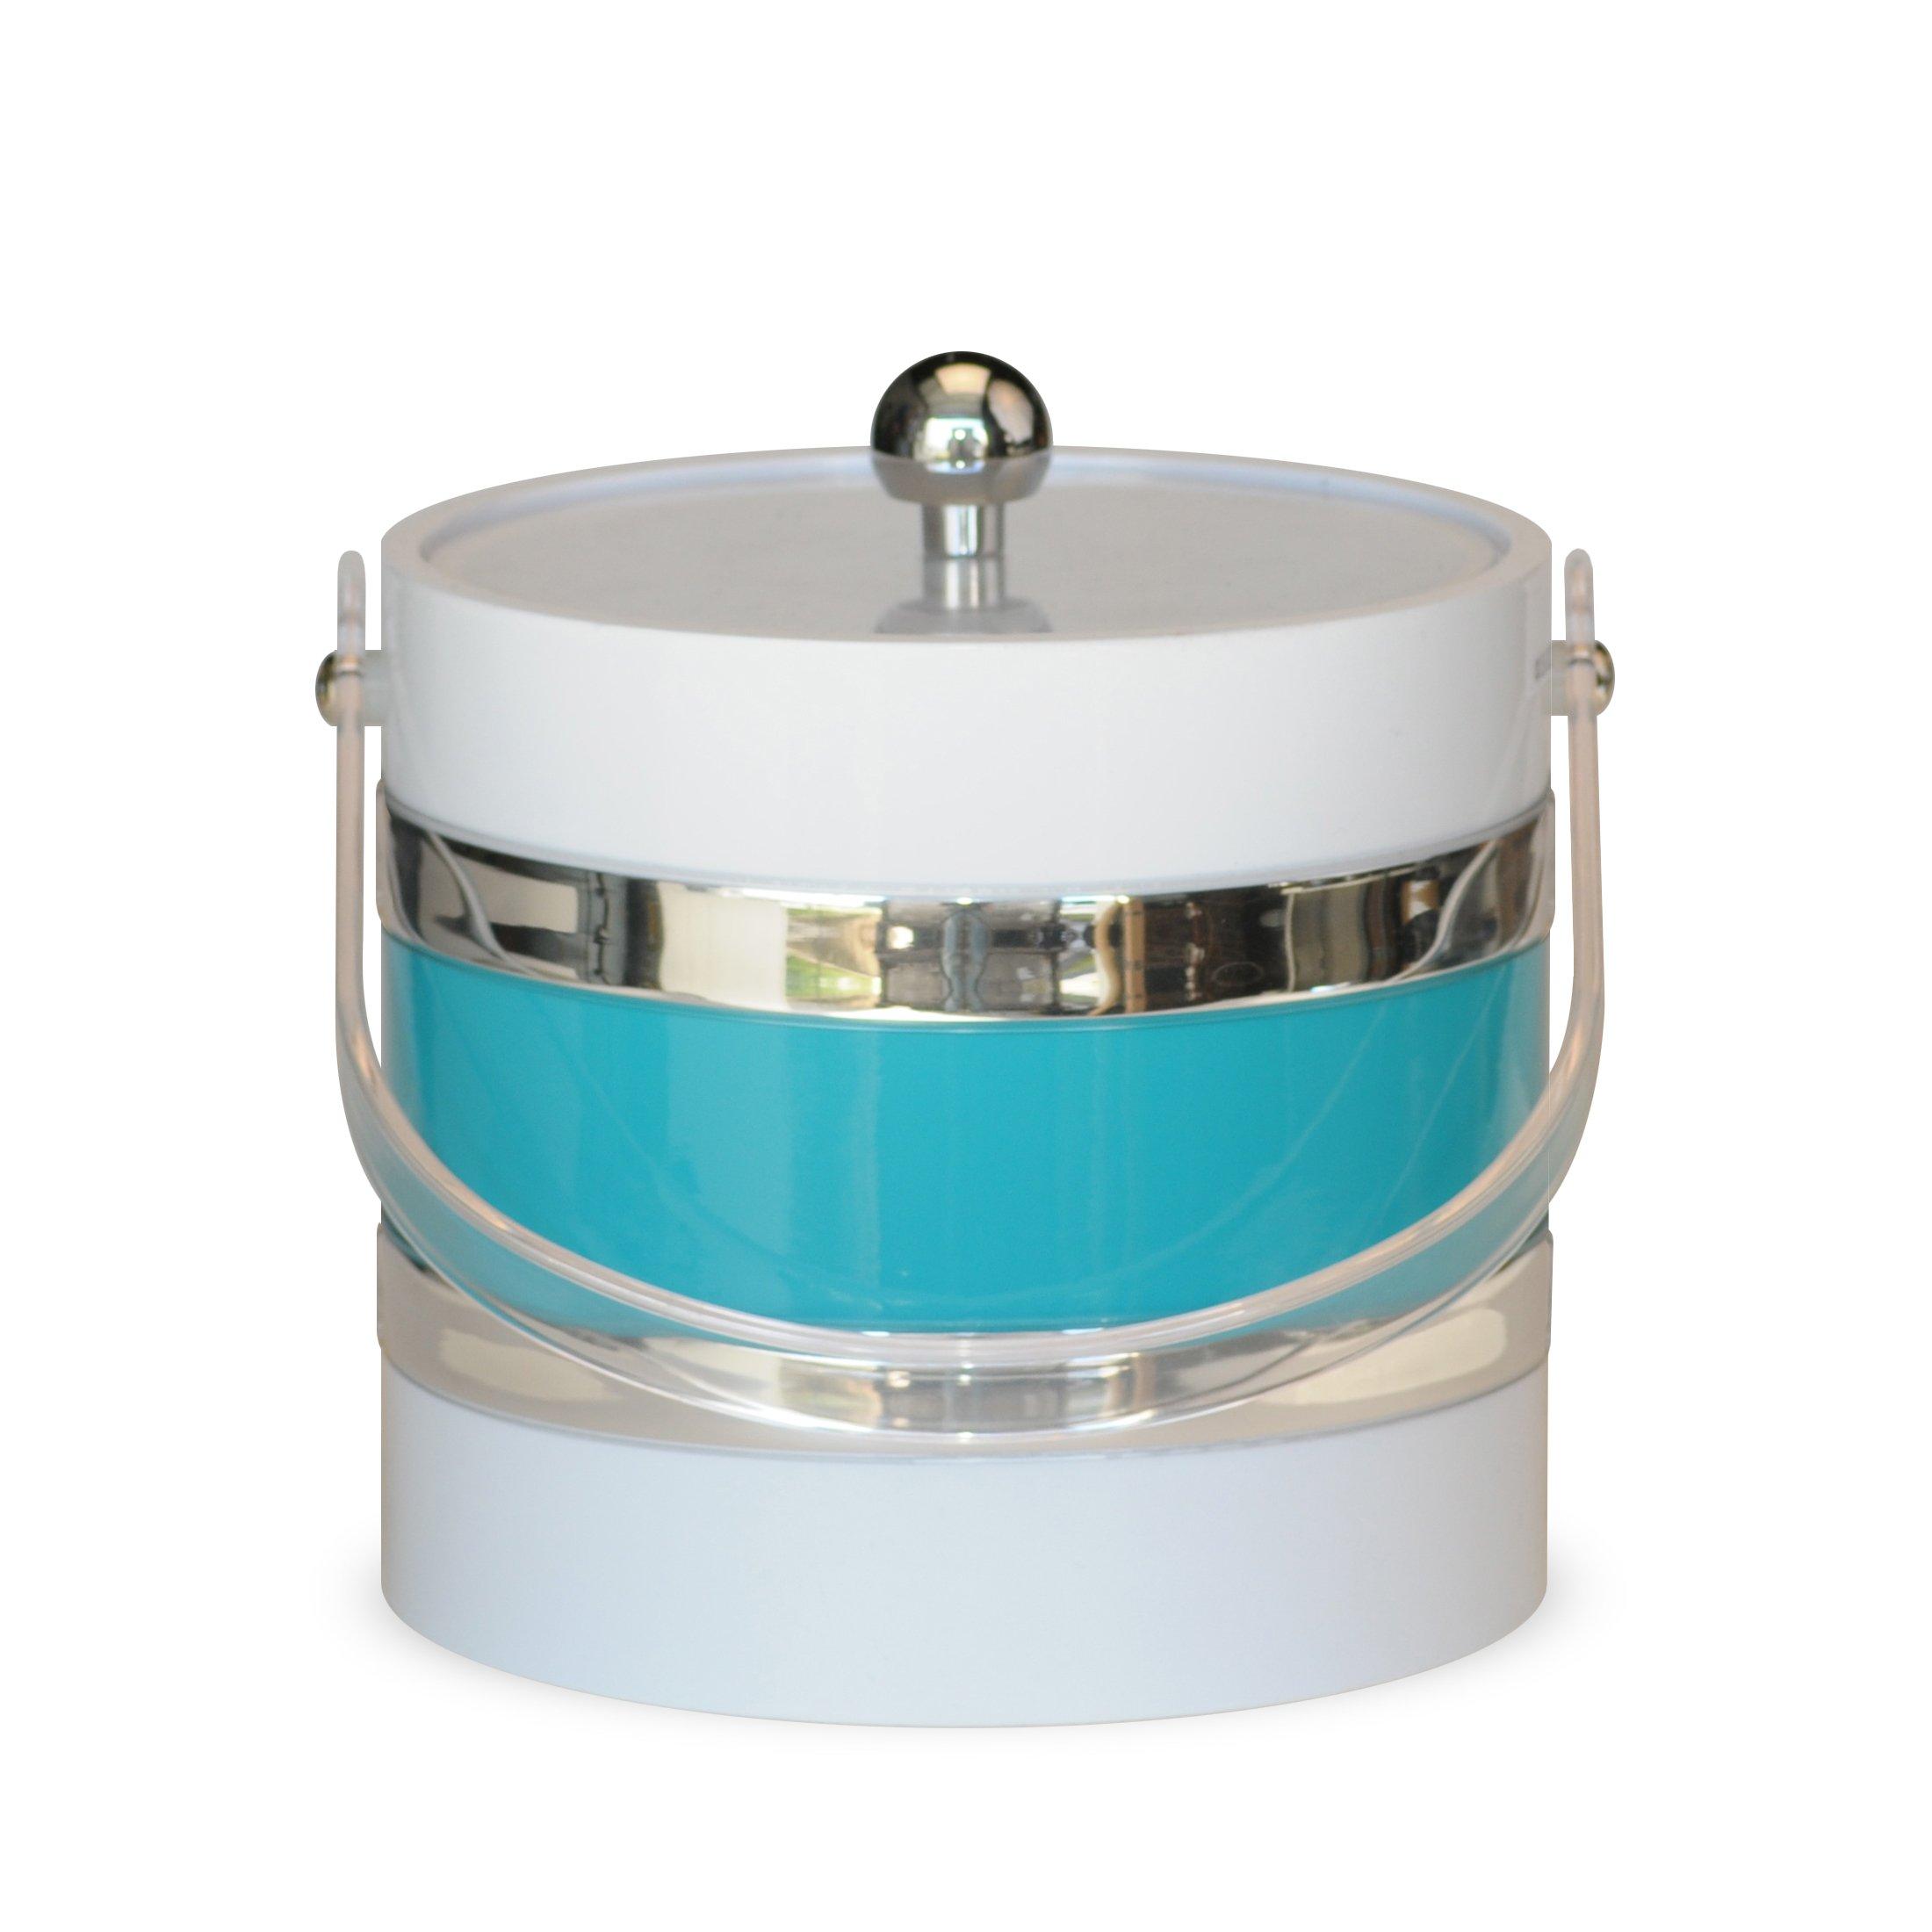 Mr. Ice Bucket Ice Bucket, 3-Quart, White with Turquoise Center